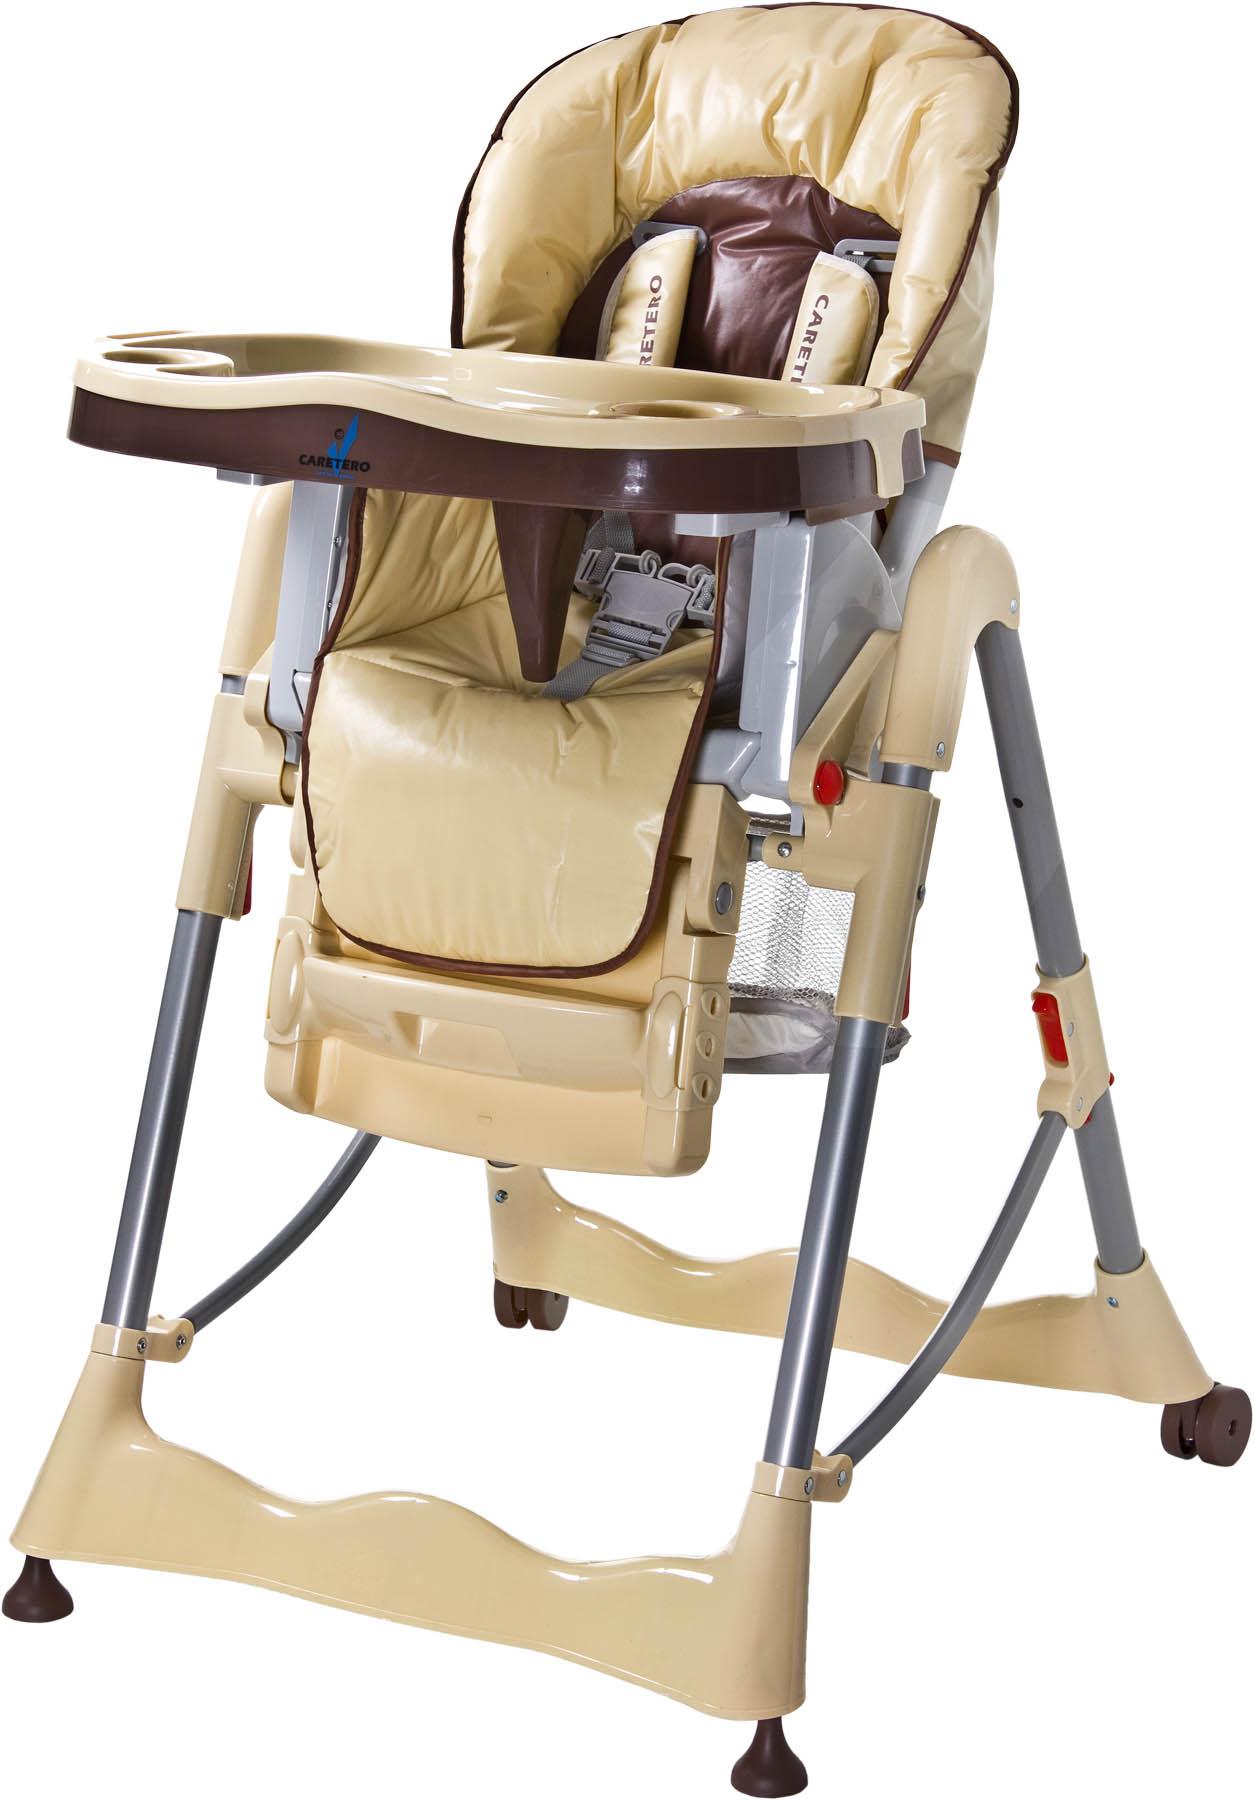 CARETERO Magnus Classic cappuccino Skládací jídelní židlička Caretero